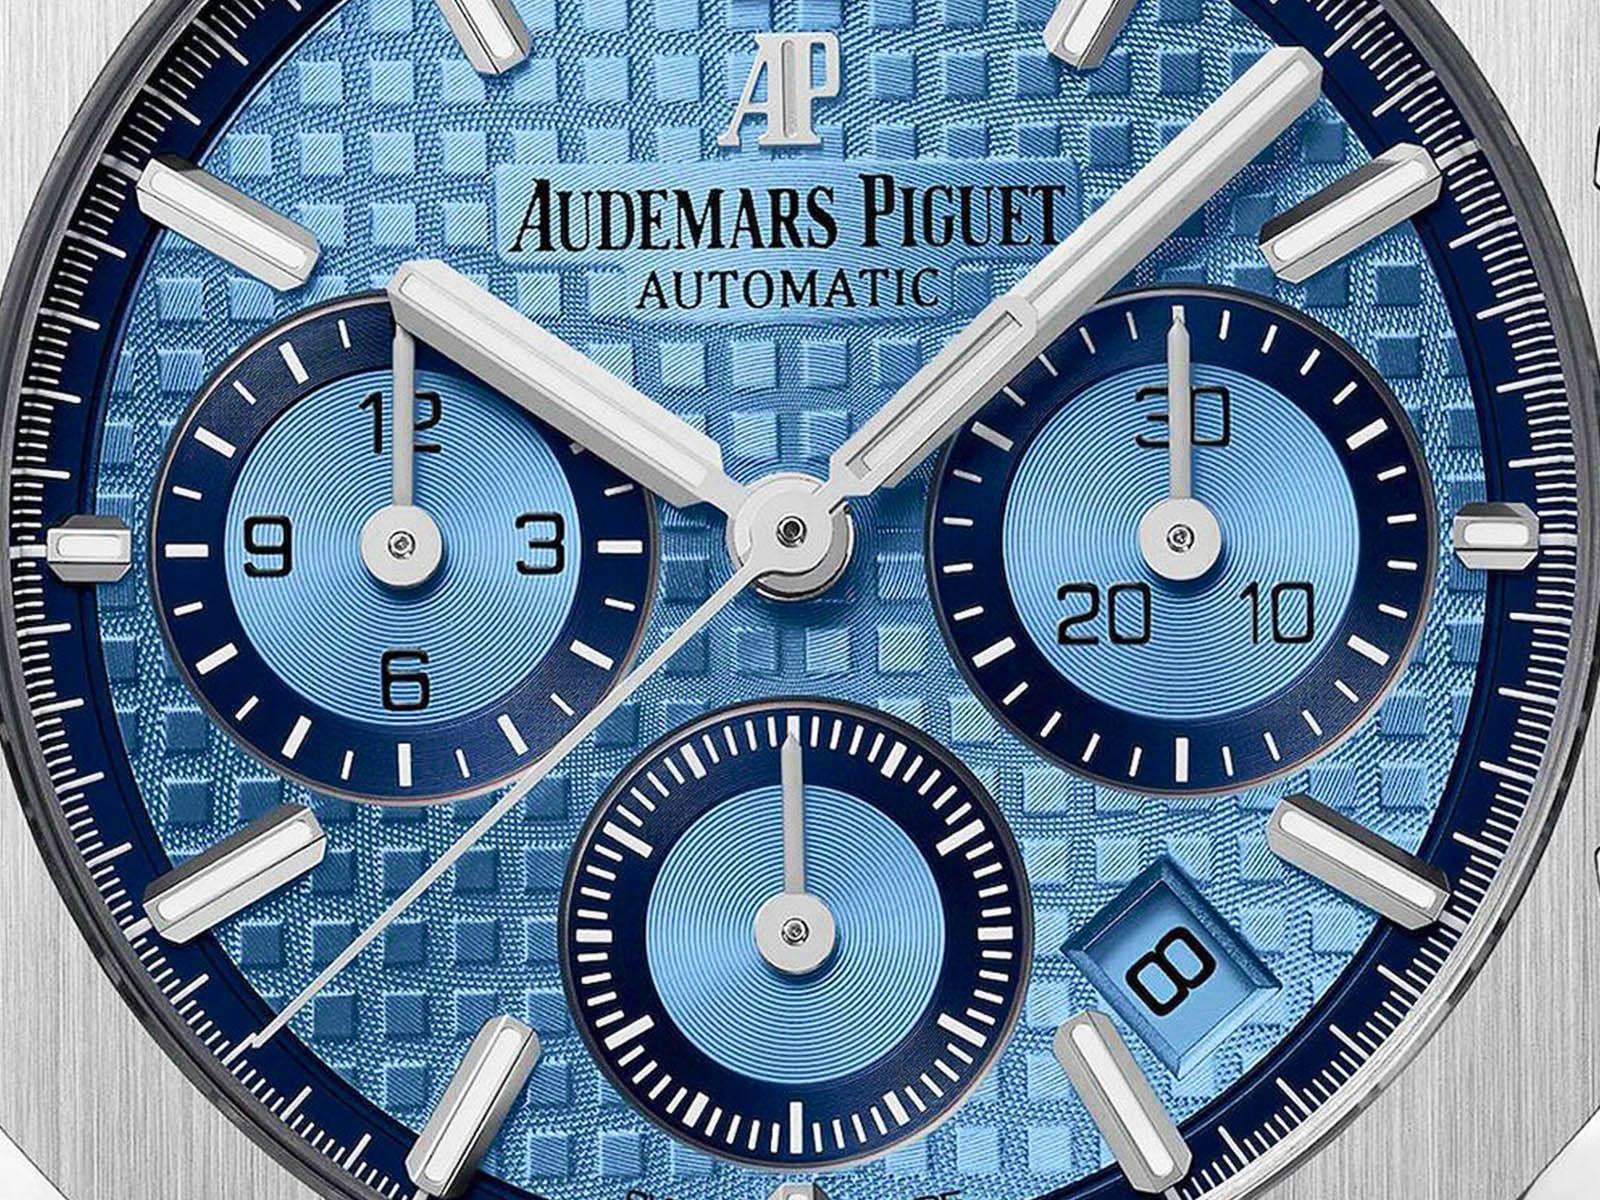 26317bc-oo-1256bc-01-audemars-piguet-royal-oak-chronograph-18k-white-gold-3.jpg